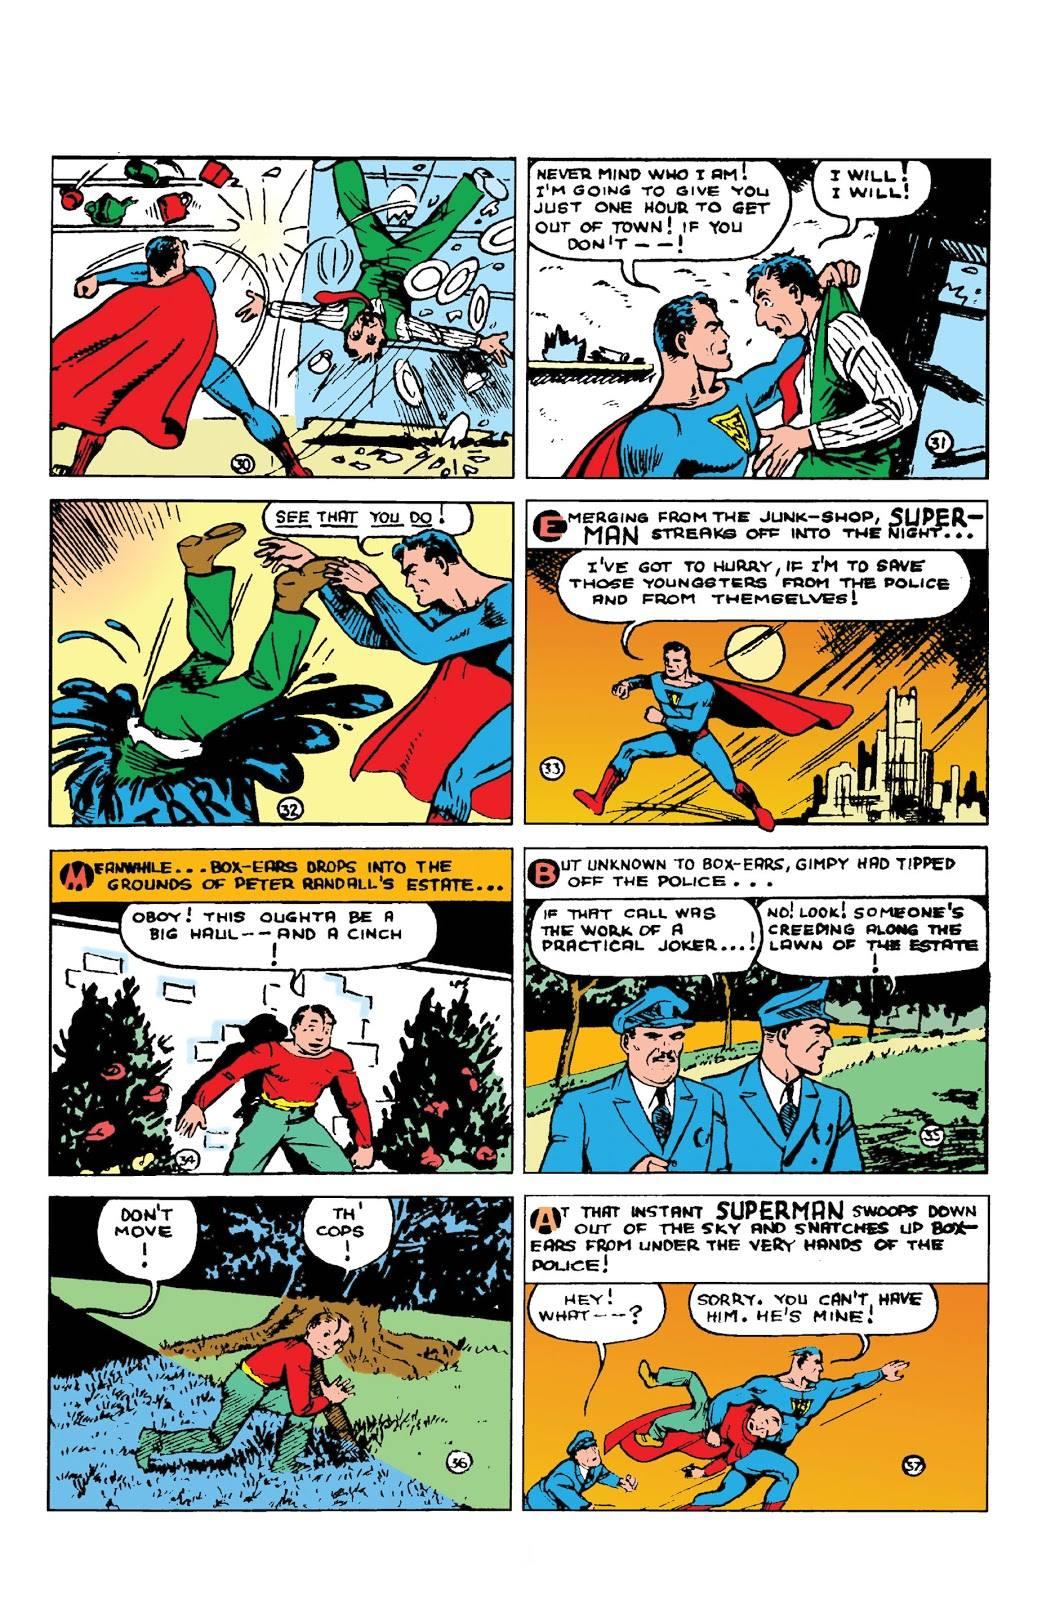 Action Comics Archives Volume 1 review